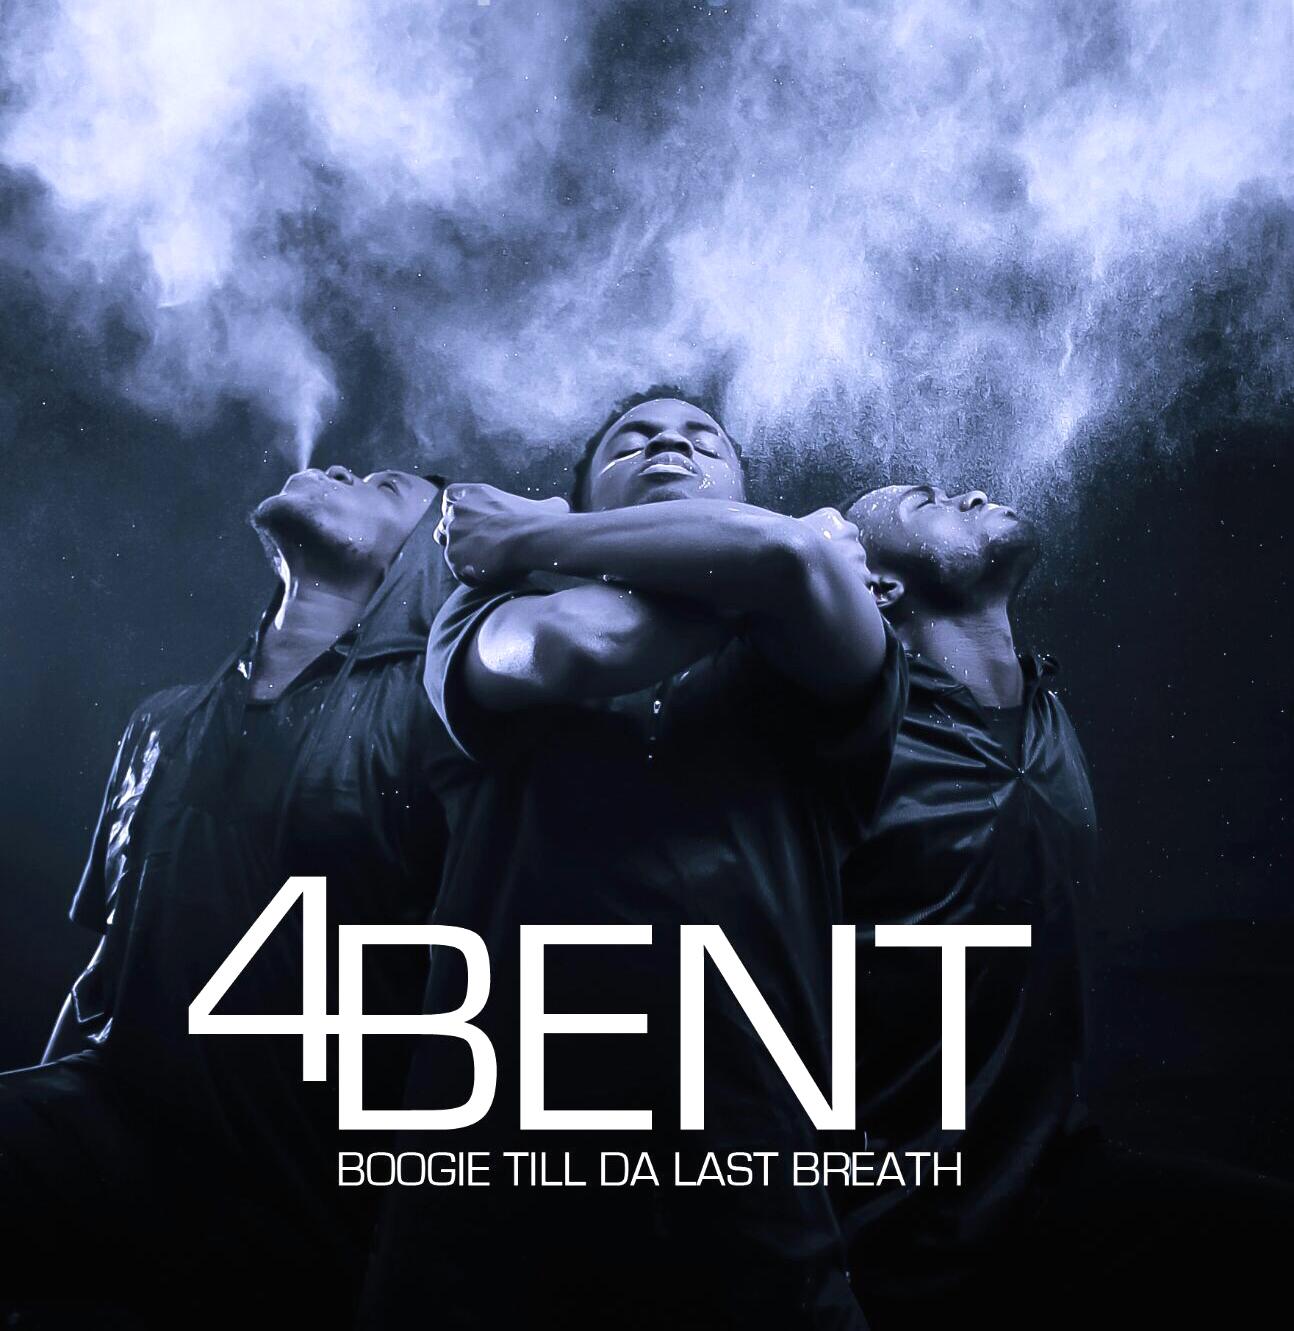 4Bent DanceCrew